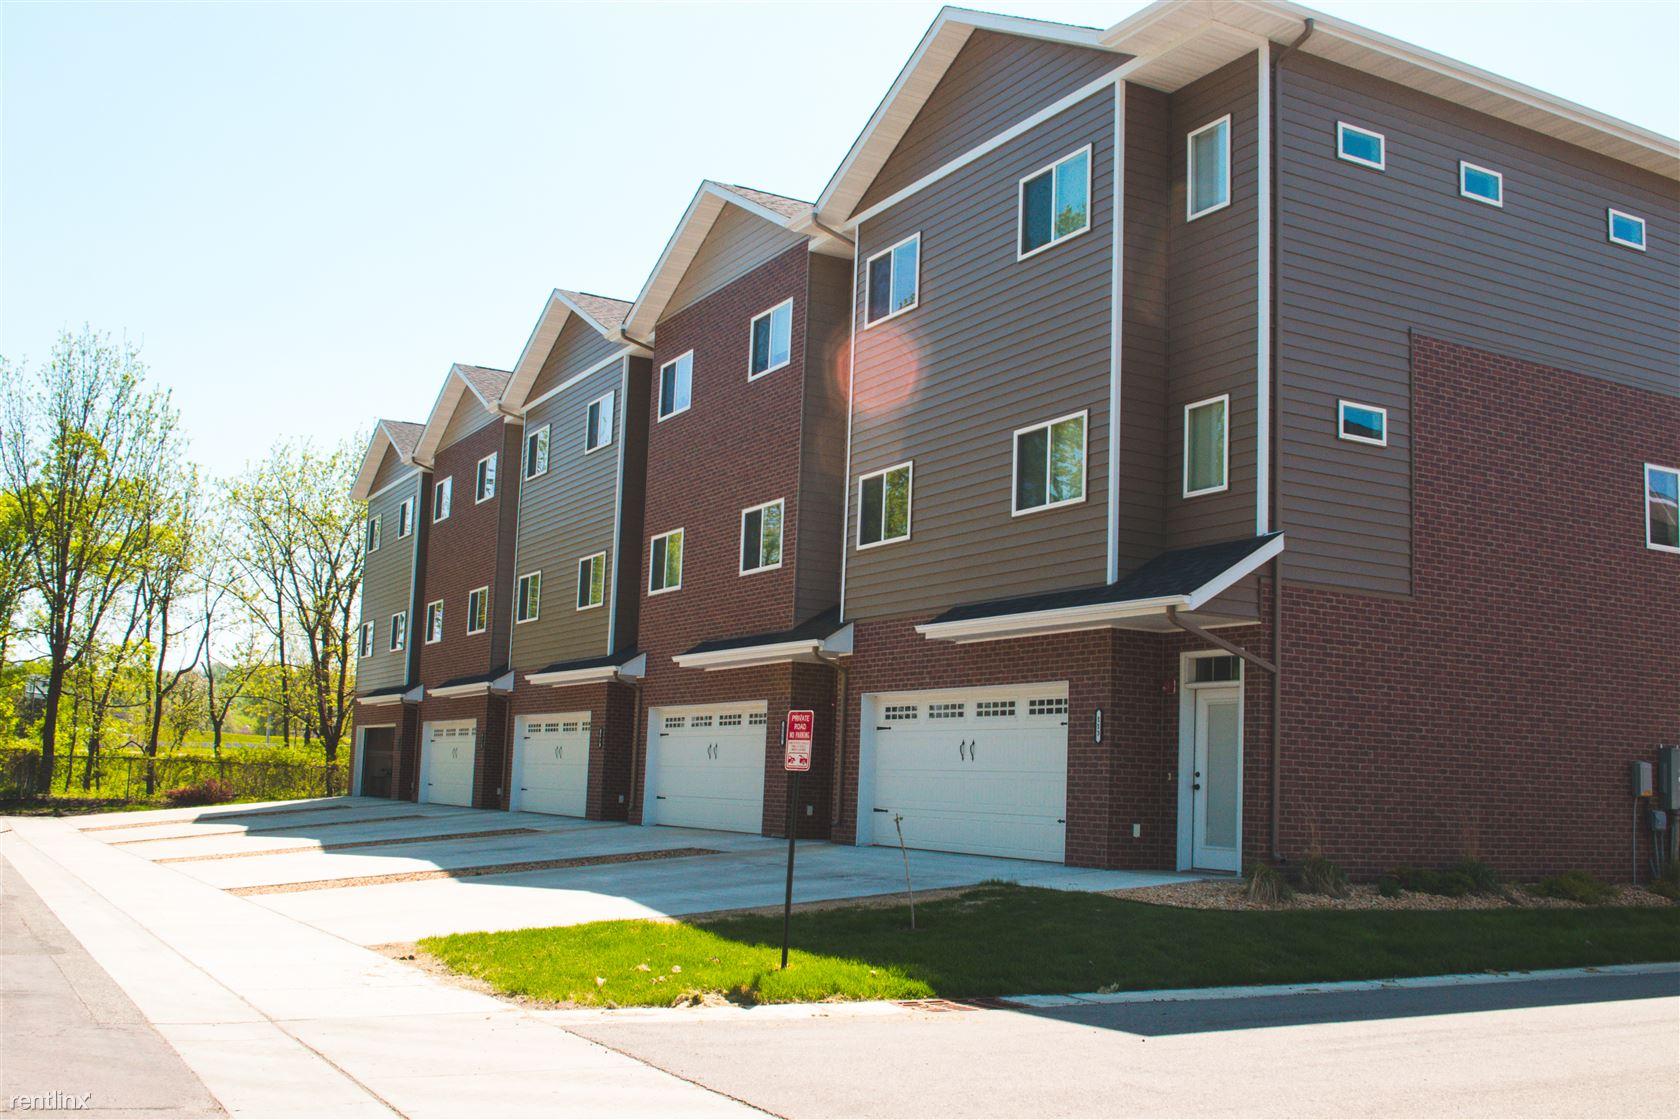 105 Wheeler Ave, North Mankato, MN - $1,950